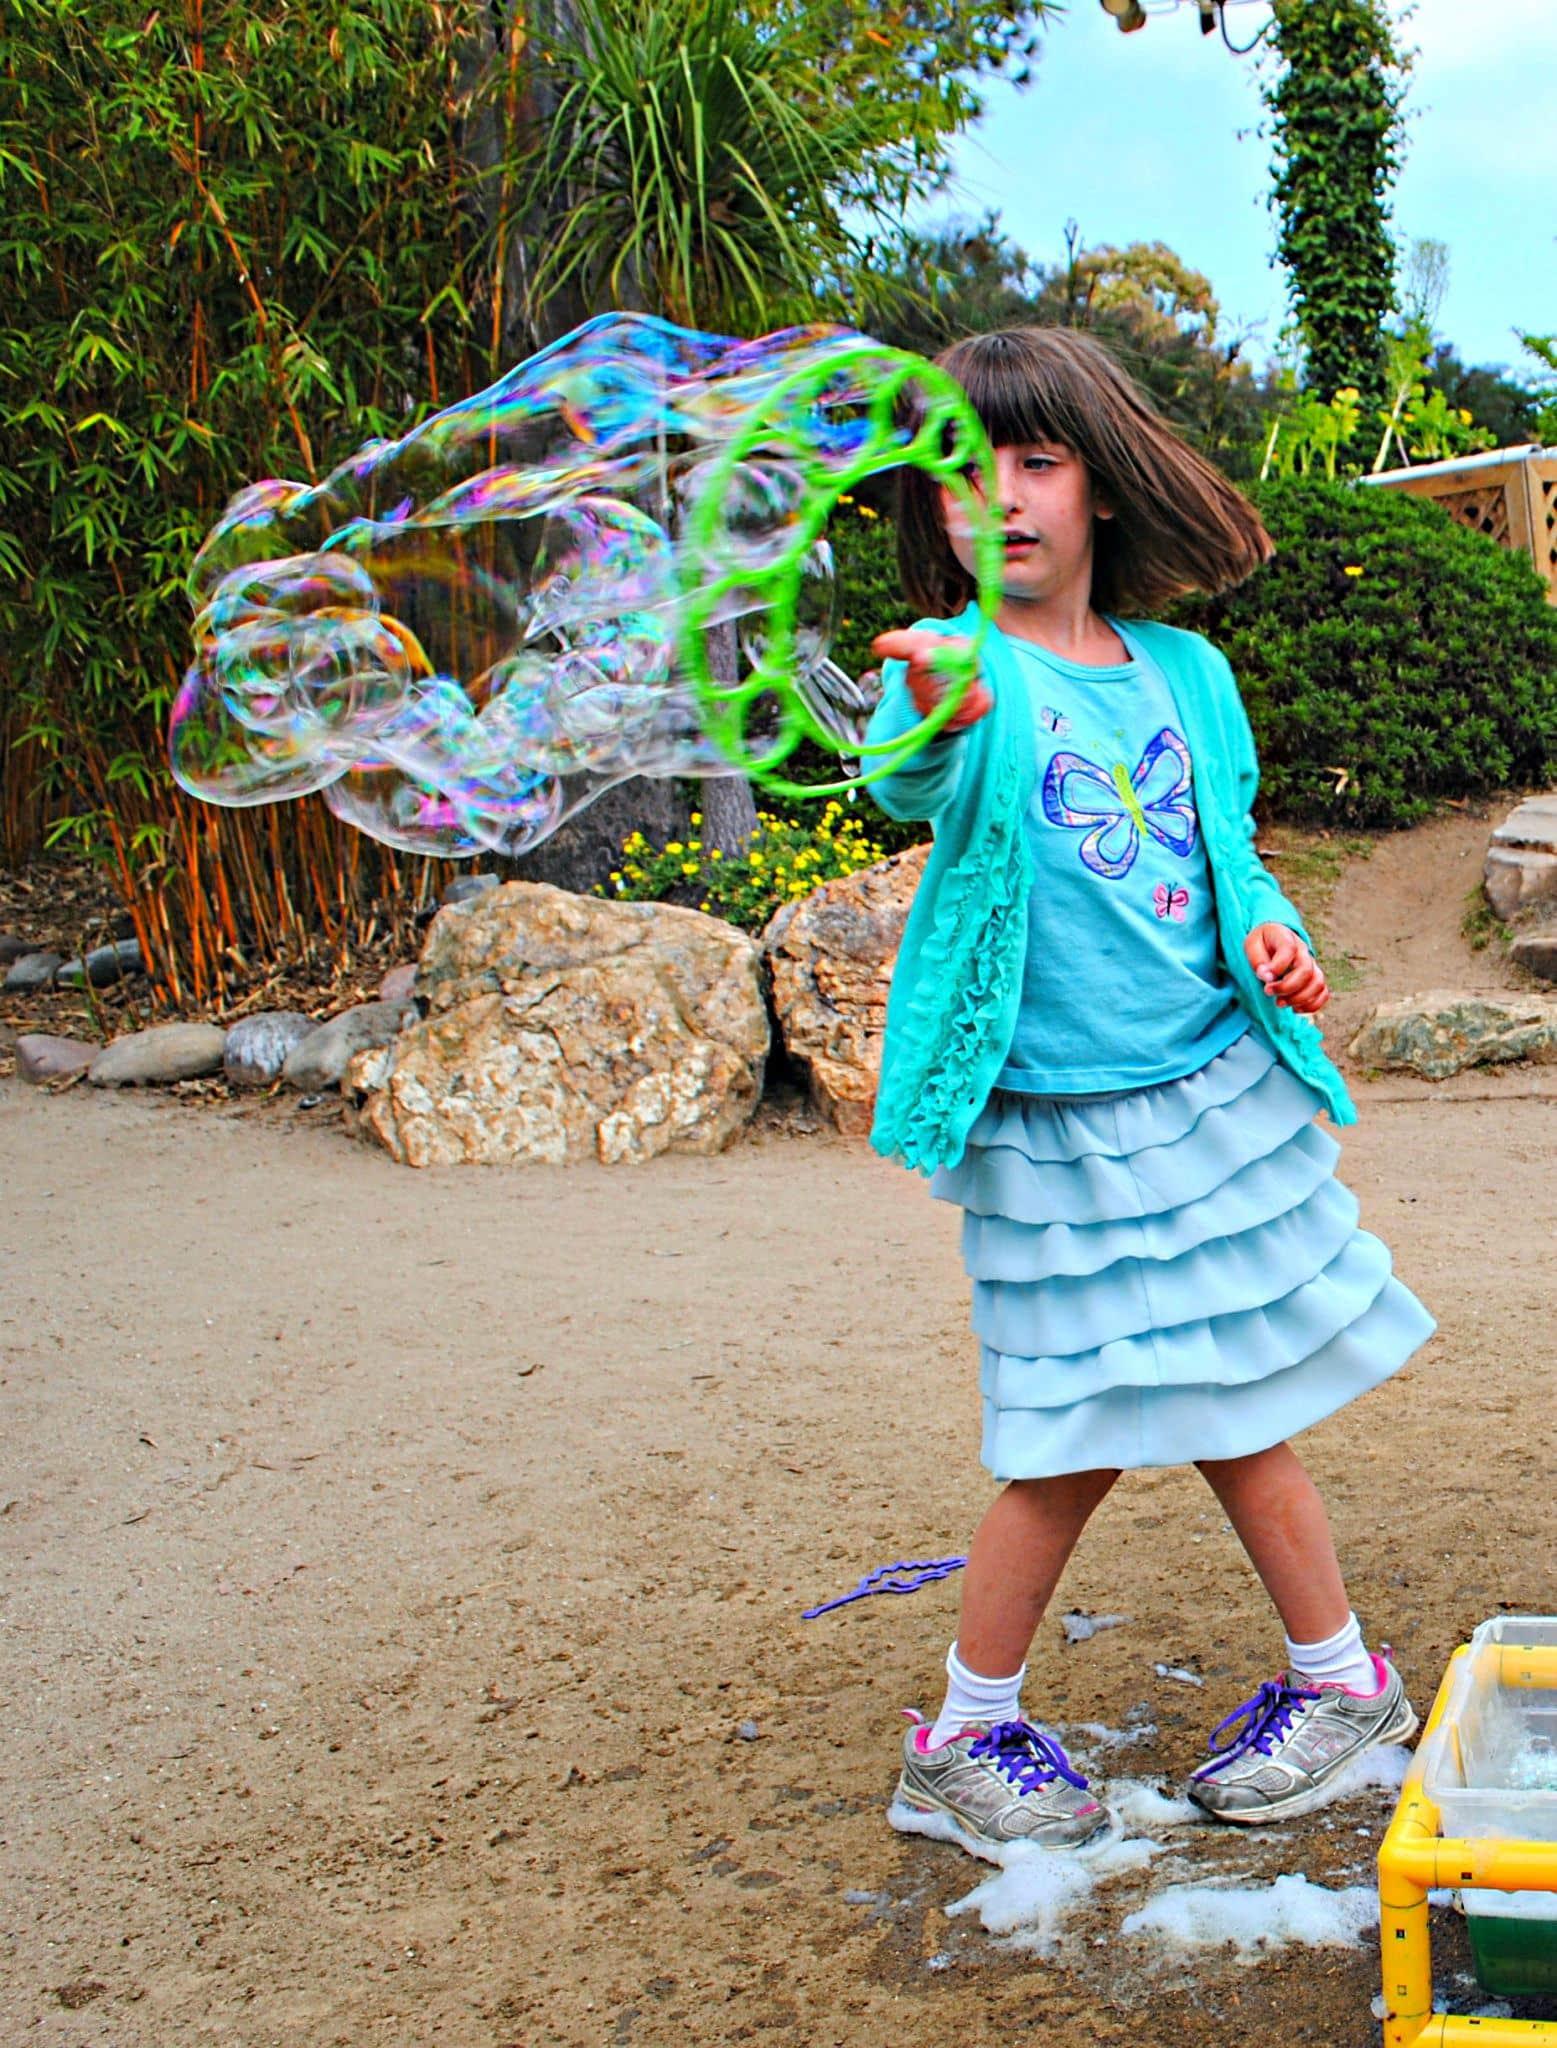 Bubble play keeps summer boredom at bay ~ 10 Fun in the Sun Summer Boredom Busters